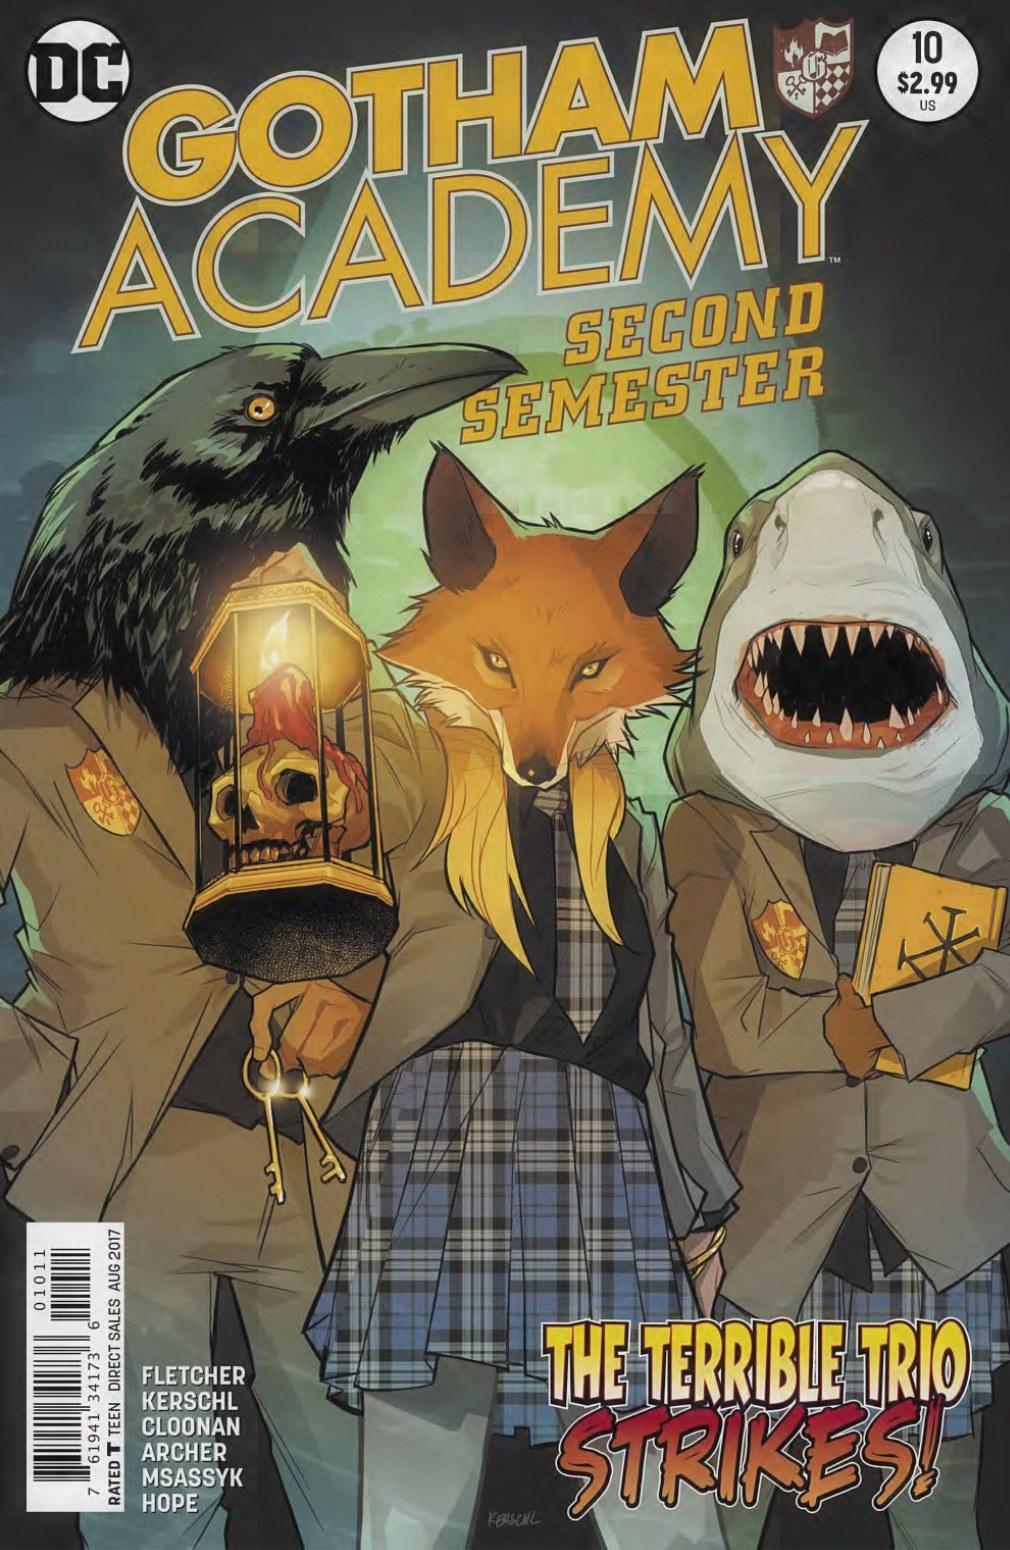 Gotham Academy Second Semester #10 Review